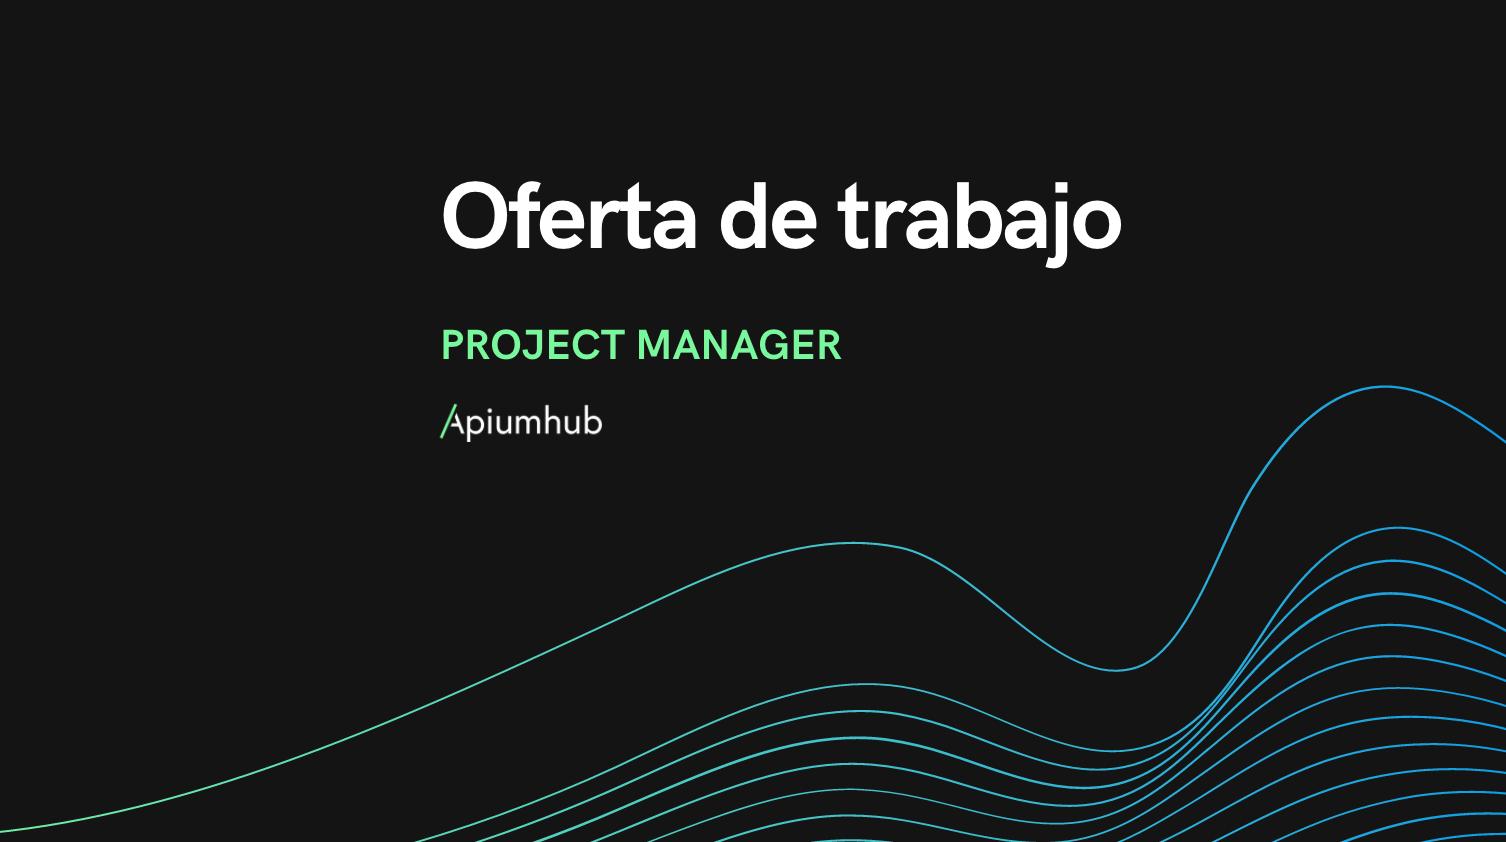 Oferta de trabajo project manager apiumhub